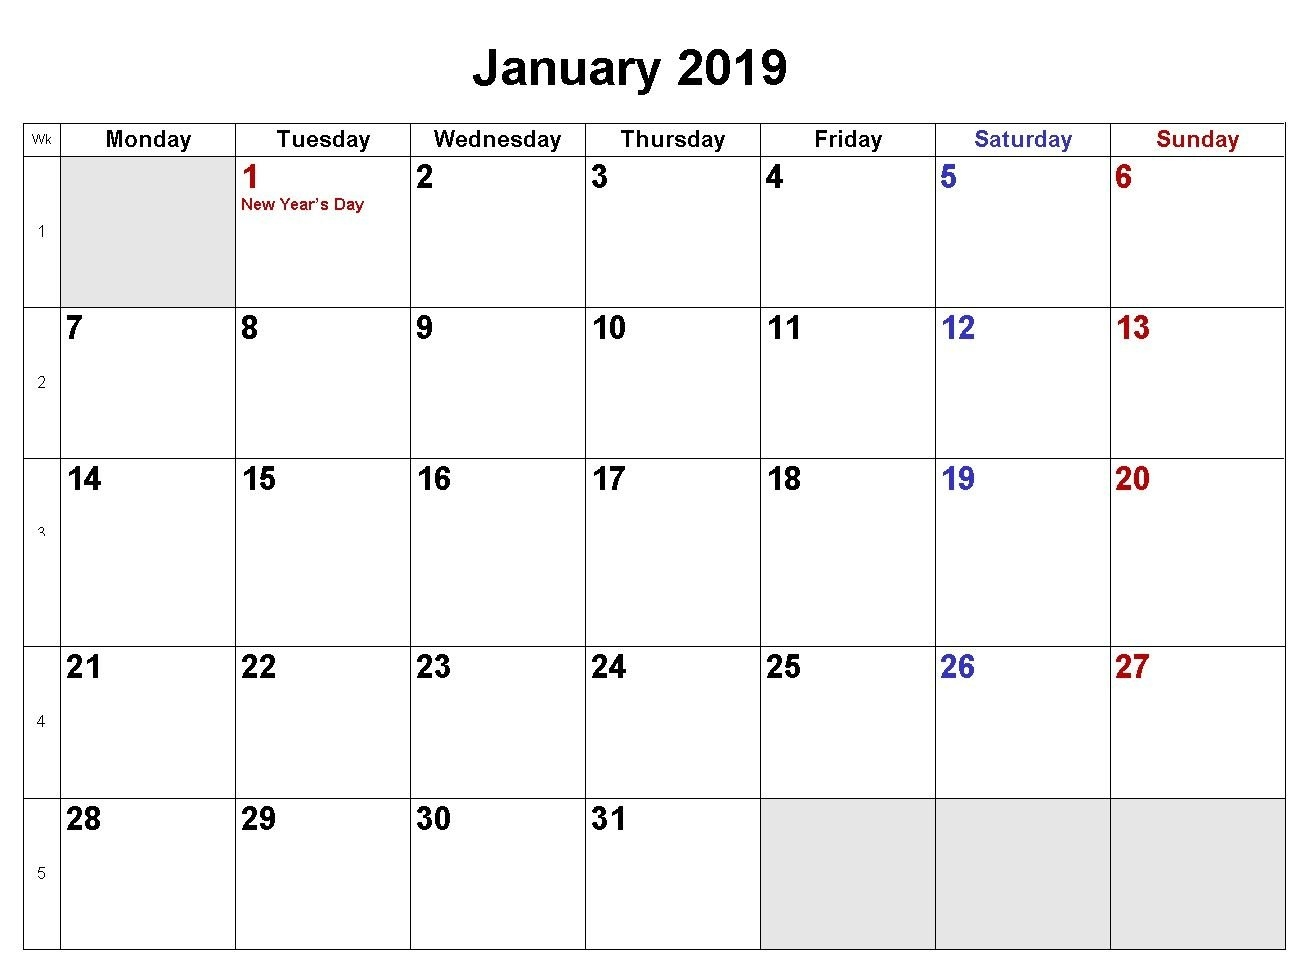 January 2019 Calendar Download In Word Excel Pdf Formats | Monthly Calendar 2019 Download Word